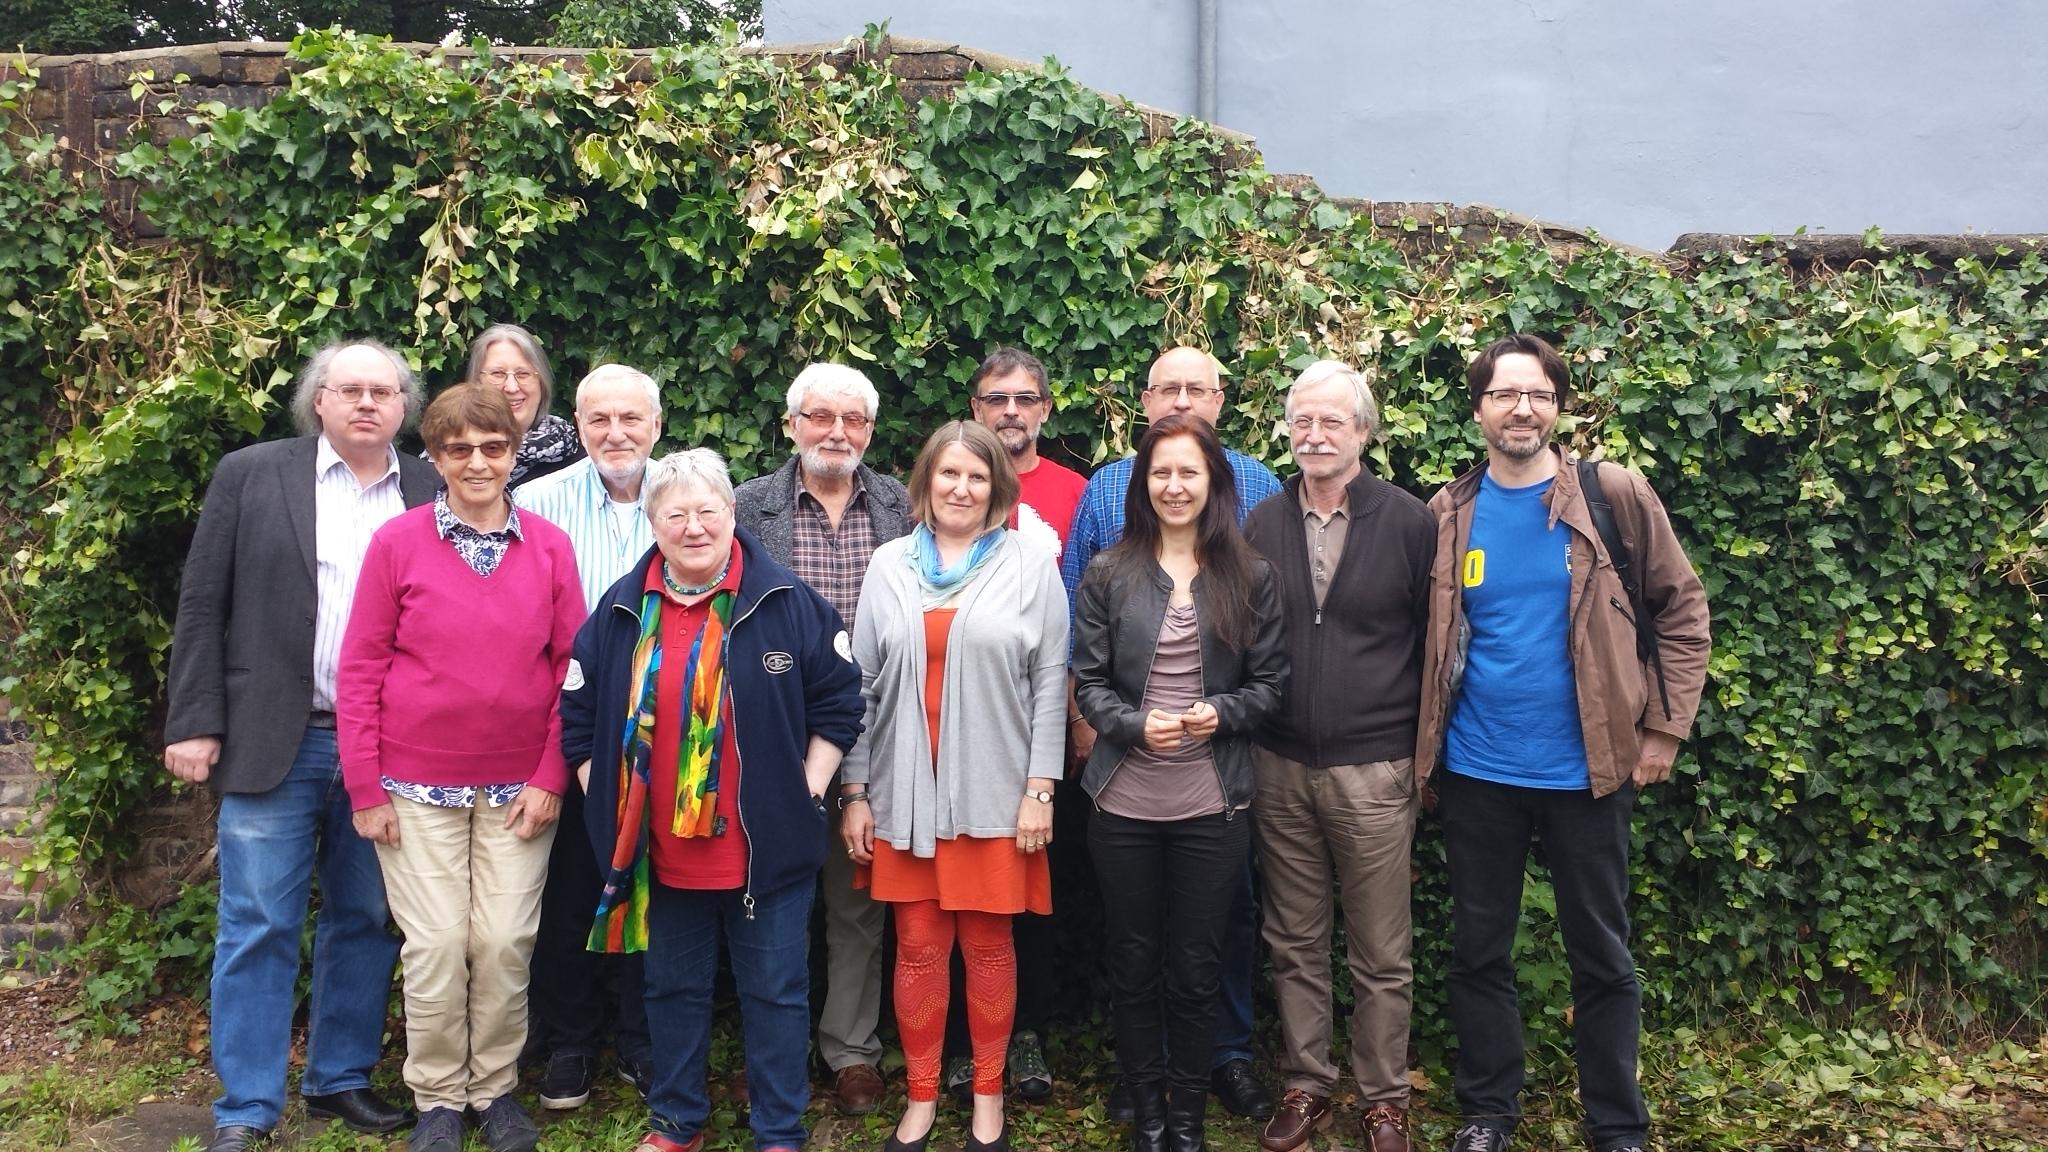 BI-Treffen am 18.6.2016 in Hamm Gegen Fracking